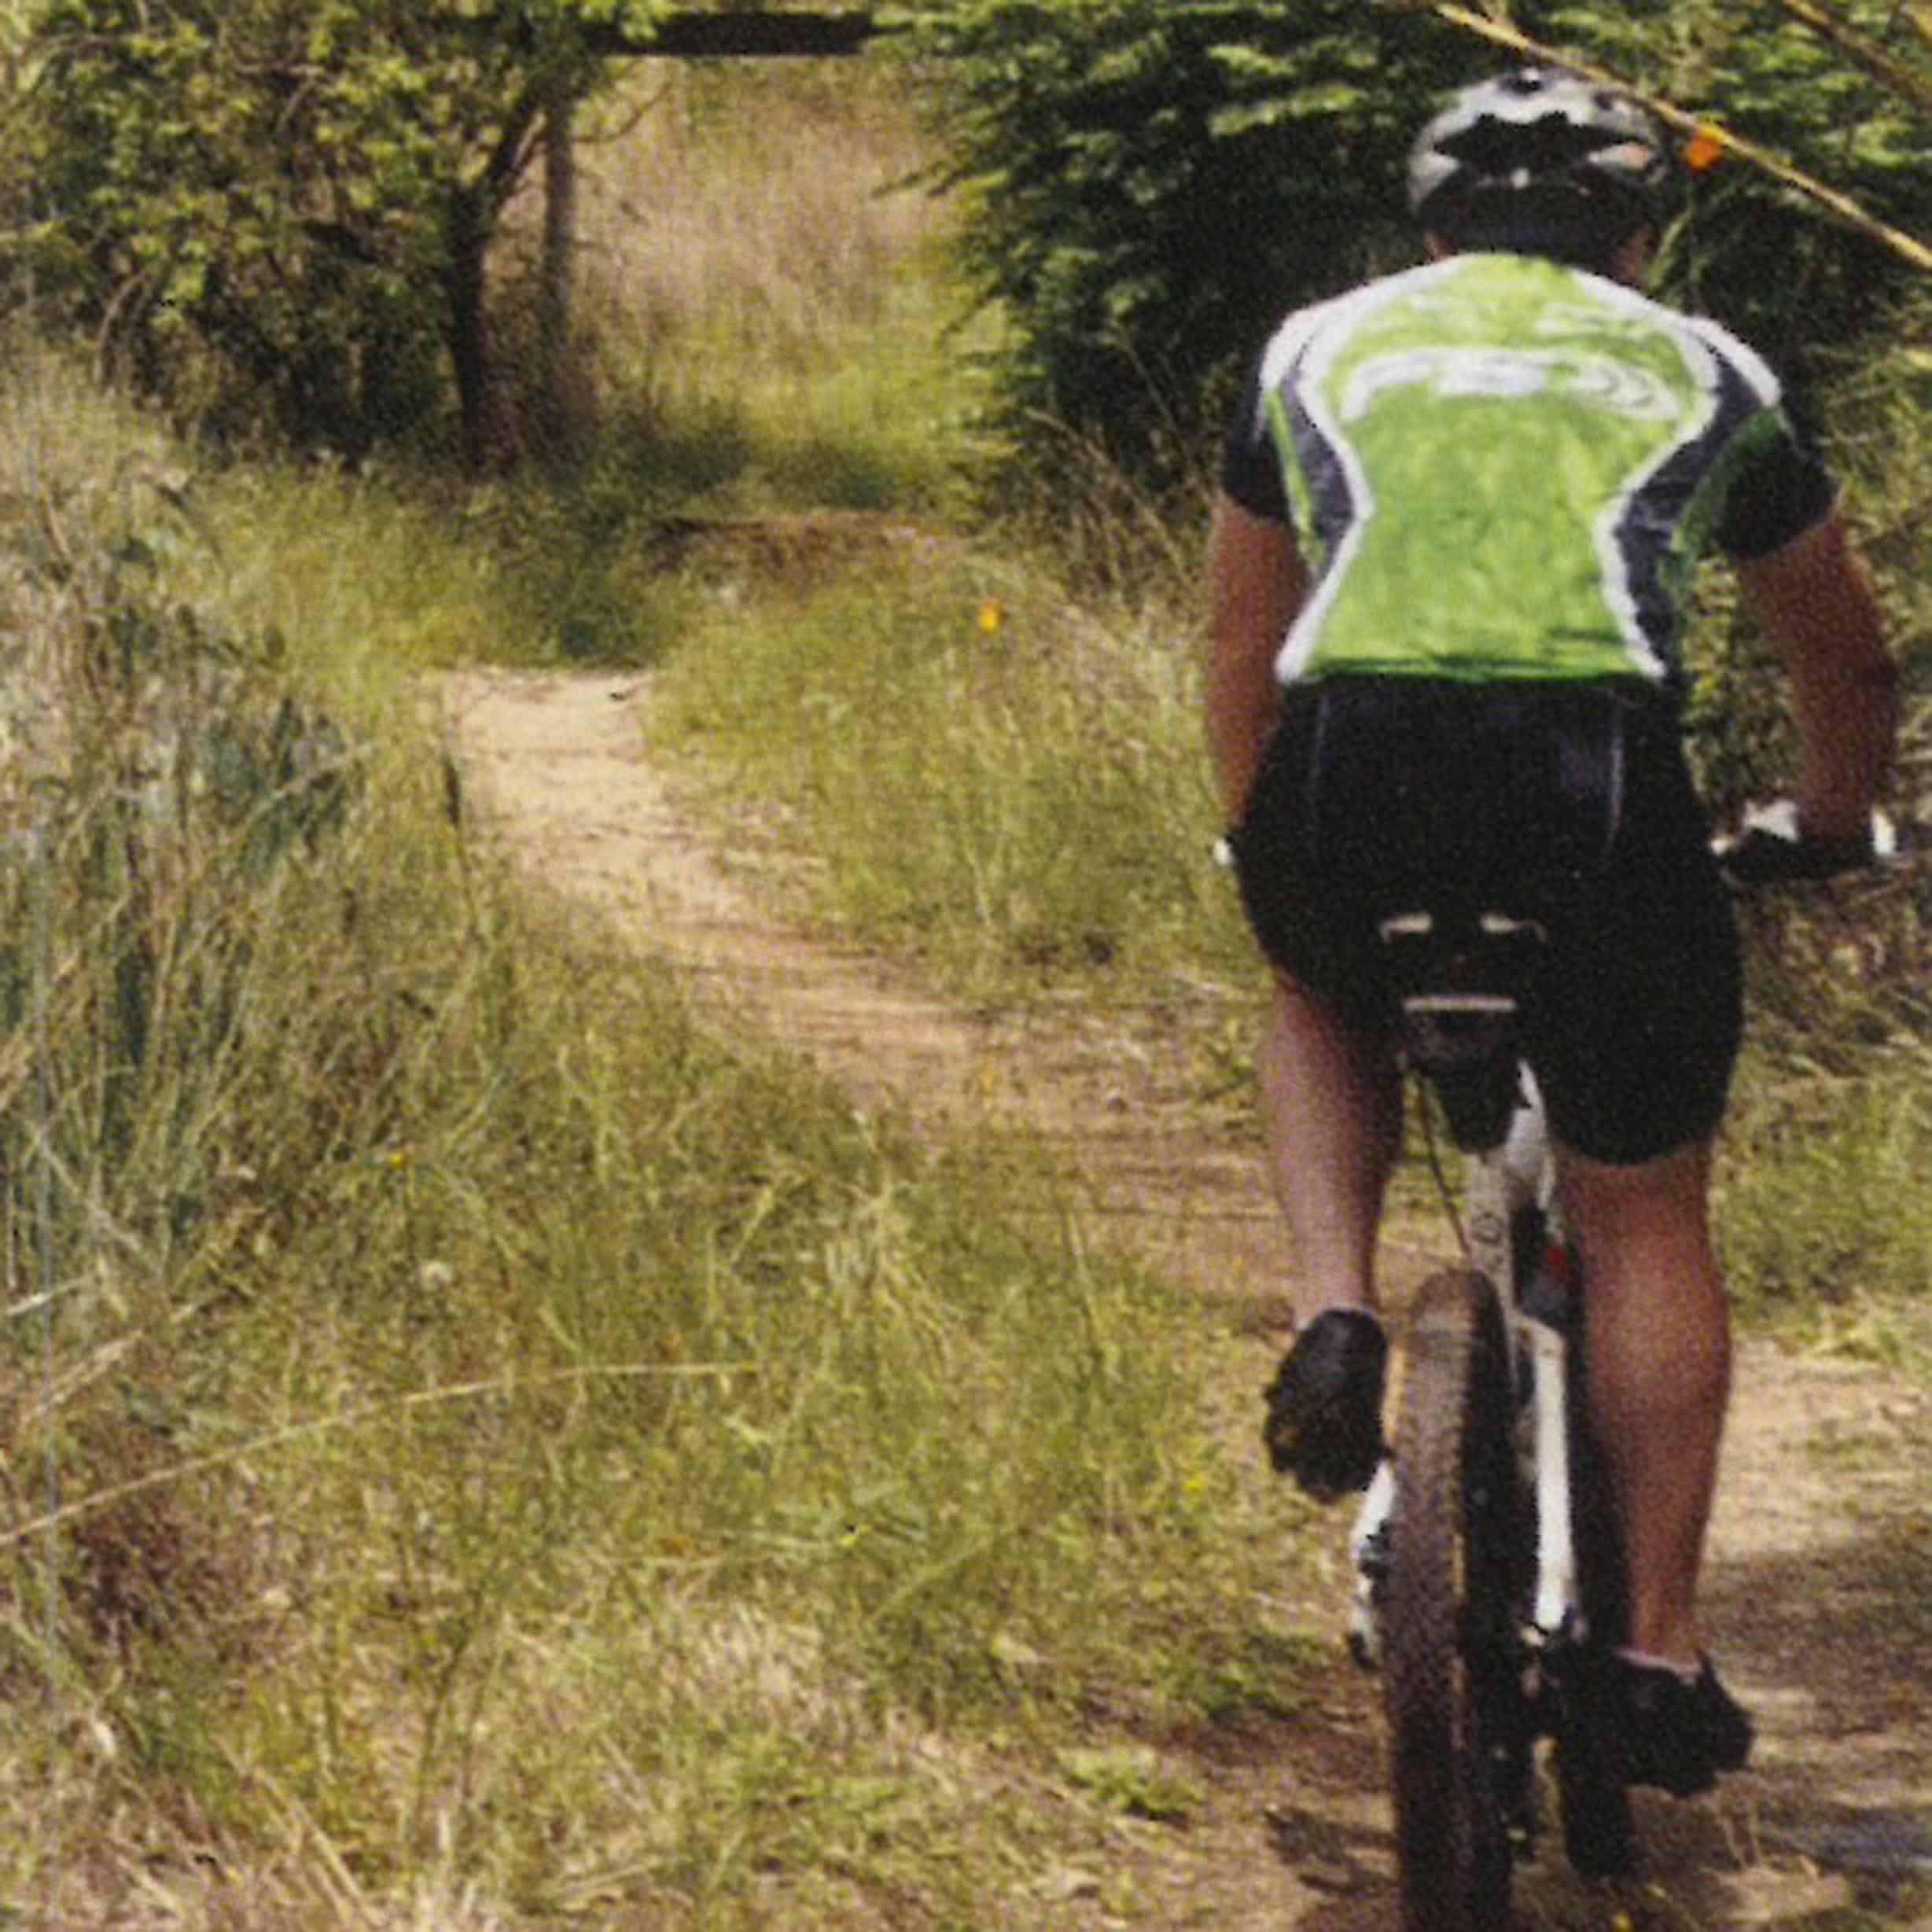 a Bientot, Avianto! Ride Free CyclePark, Muldersdrift, Jhb